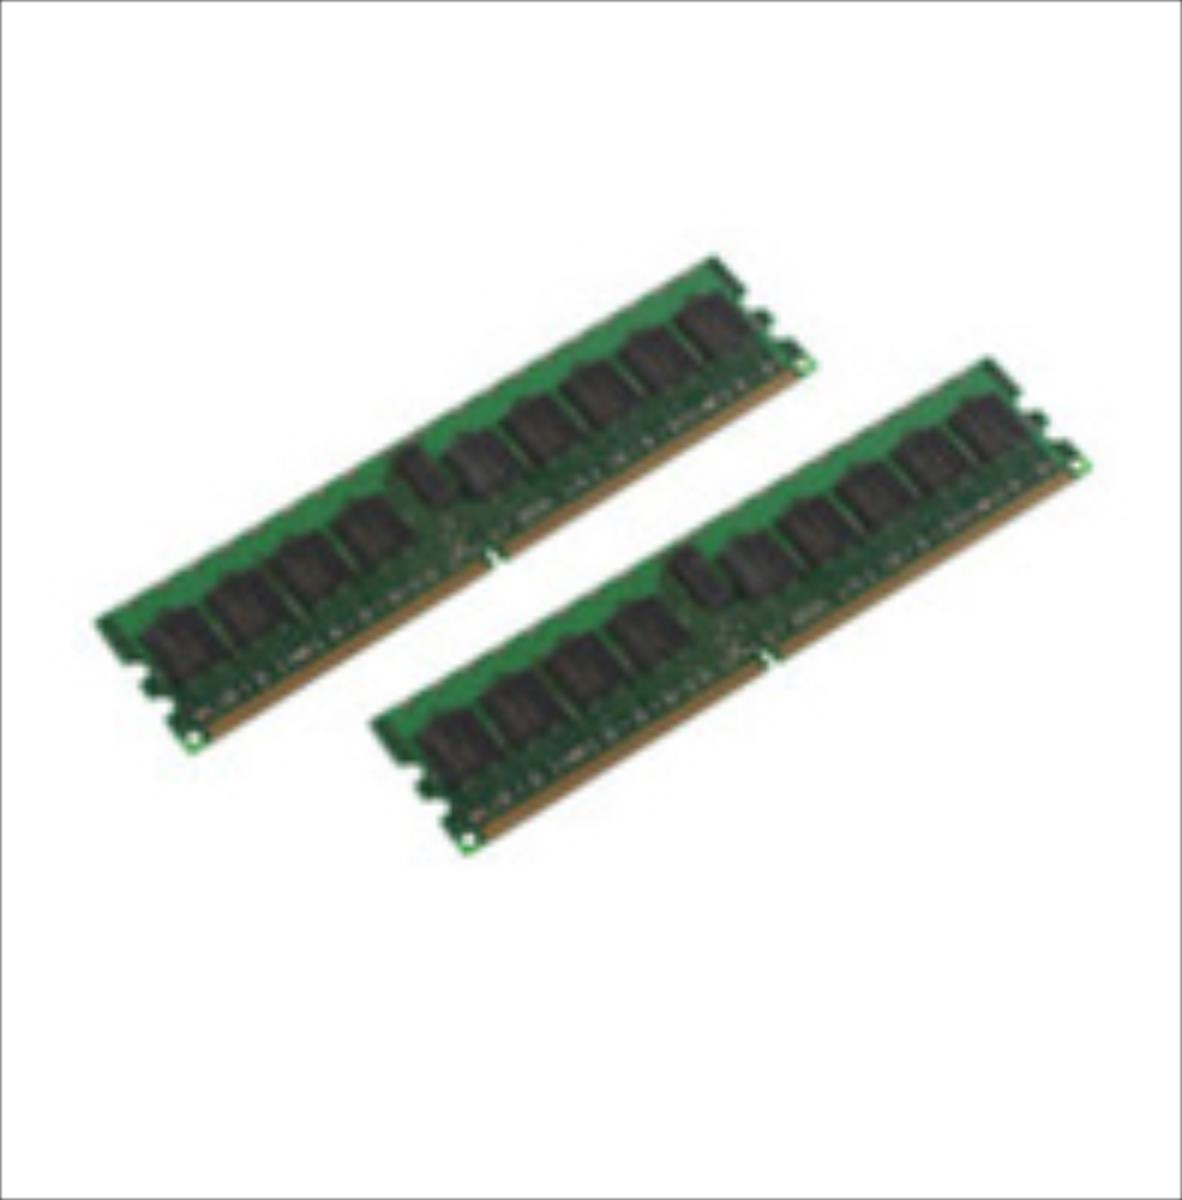 MicroMemory 8GB KIT DDR2 667MHZ ECC/REG KIT OF 2x 4GB DIMM MMI0348/8GB, KTM2759K2/8G, 41Y2767 (2PCS), 41Y2768, FRU 40T7980 MMI0348/8GB